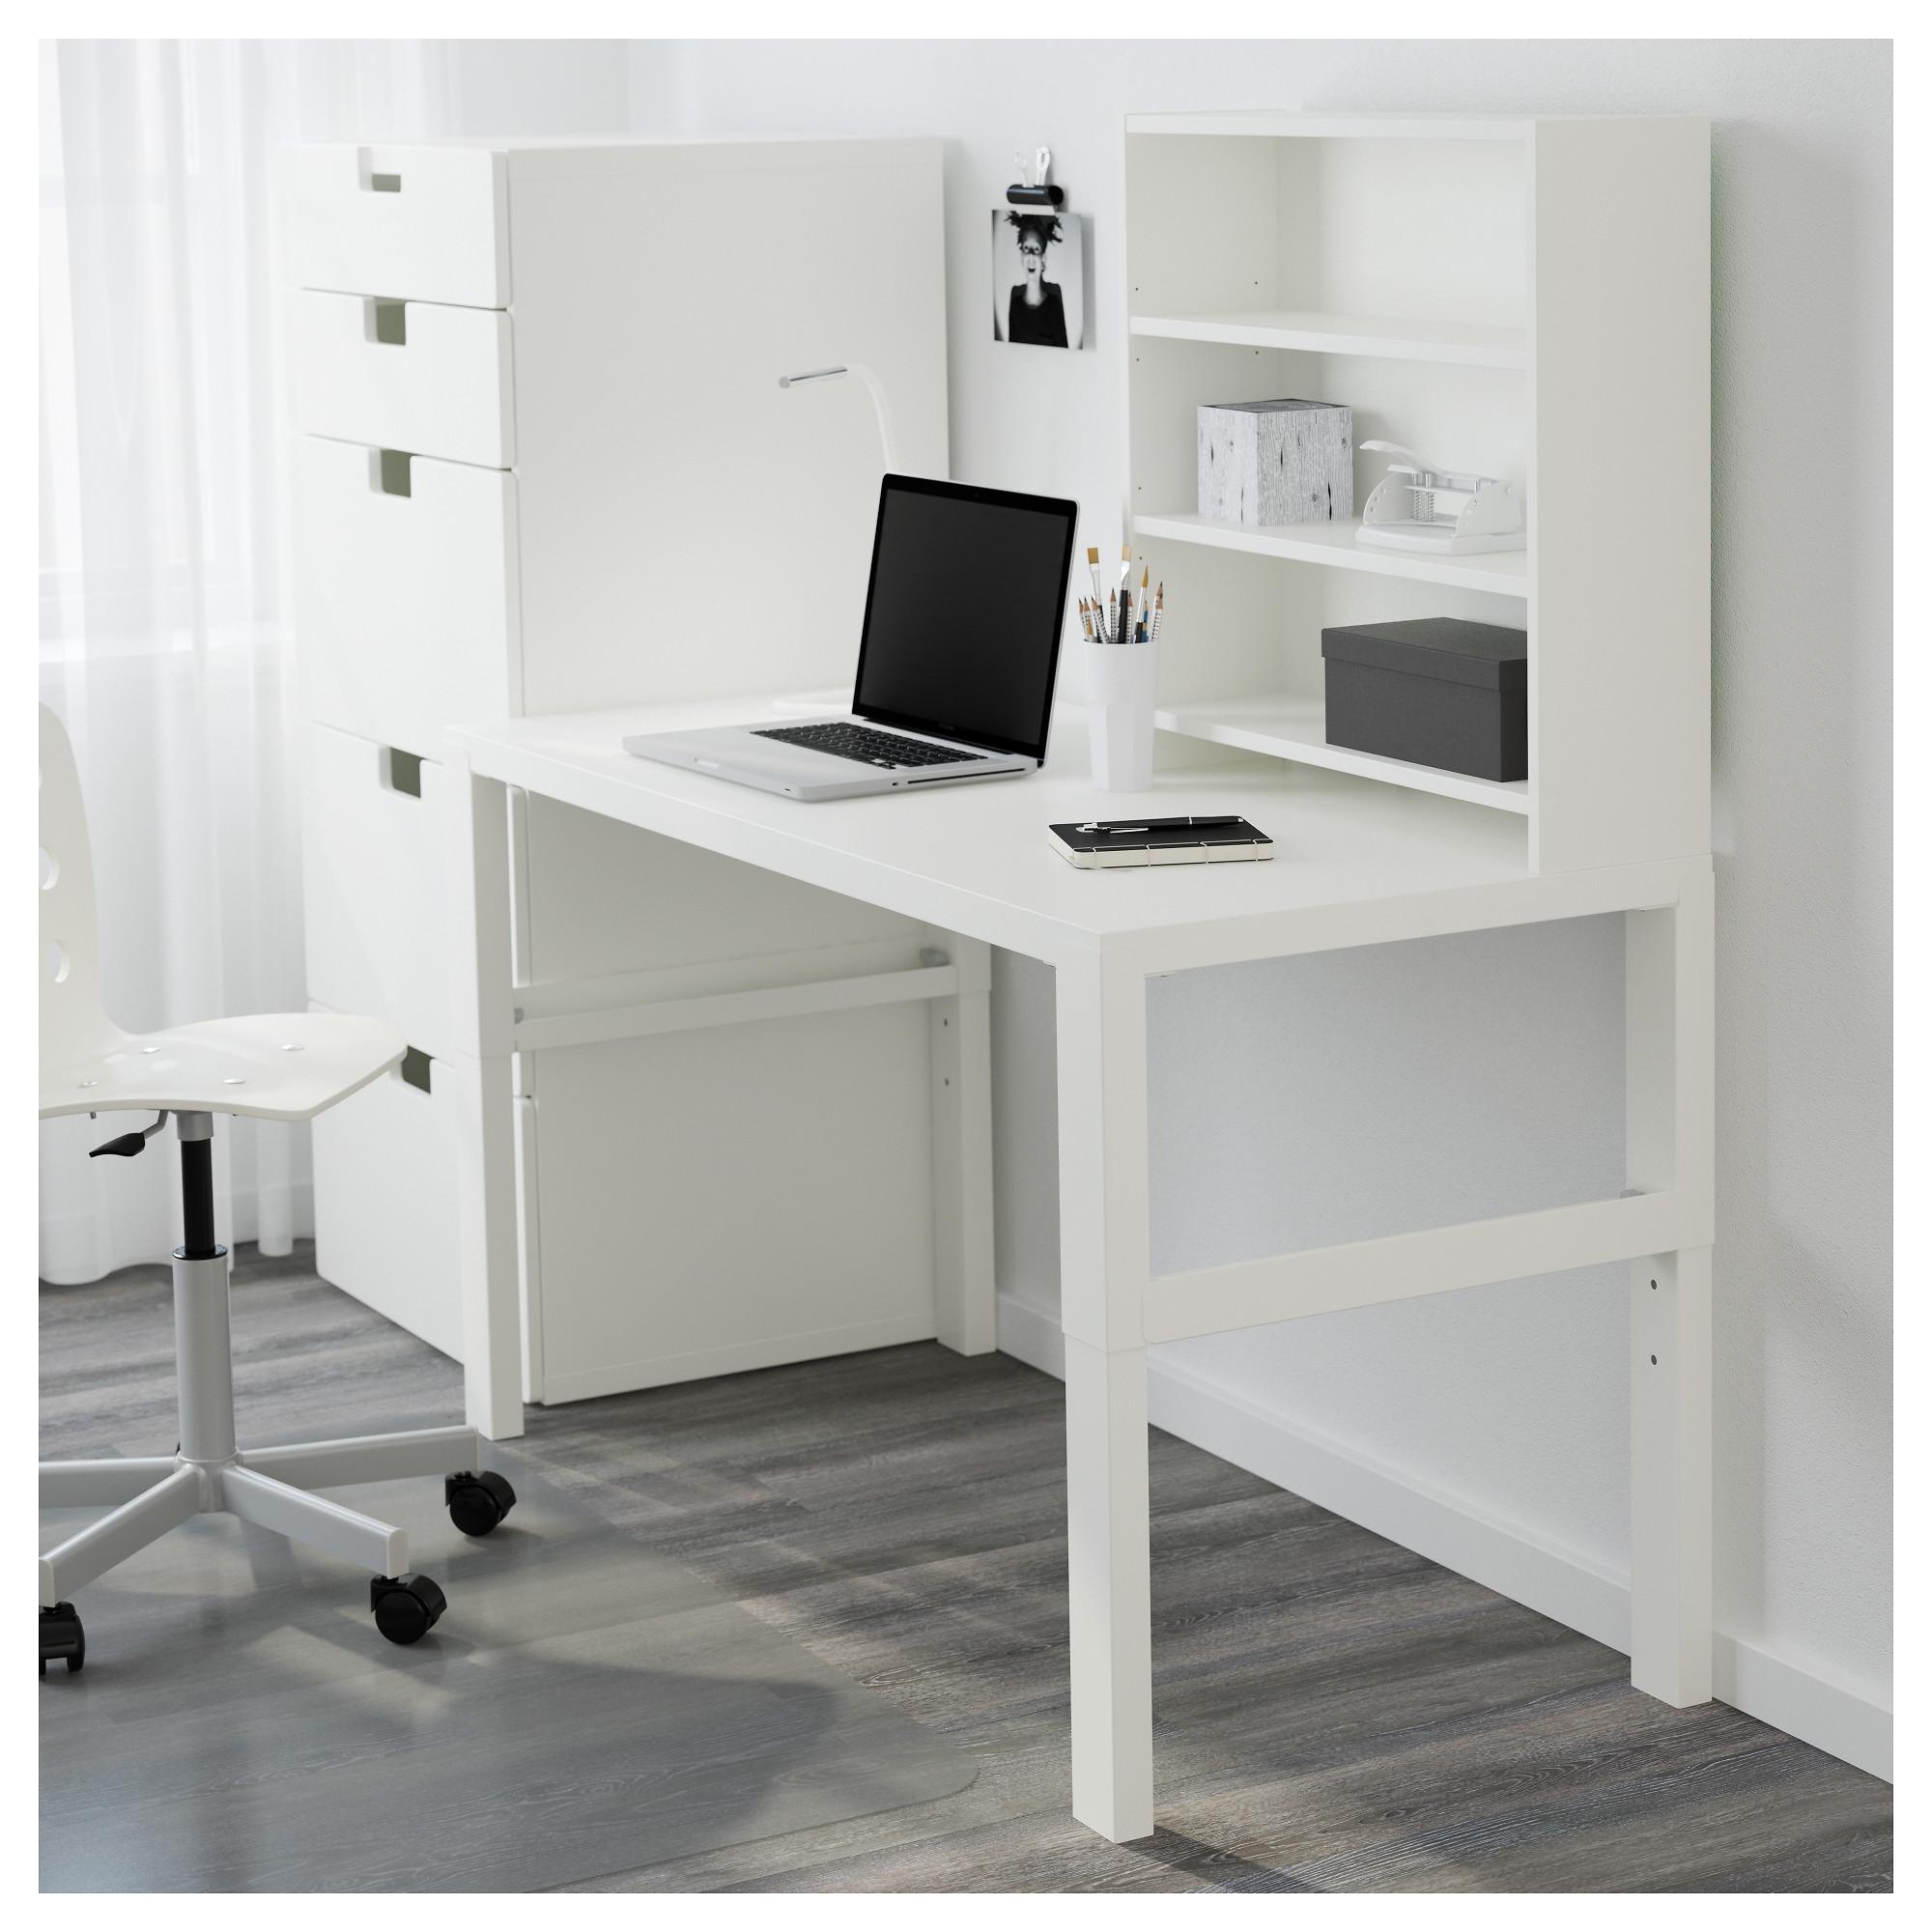 Ikea - Bureau peu encombrant ...